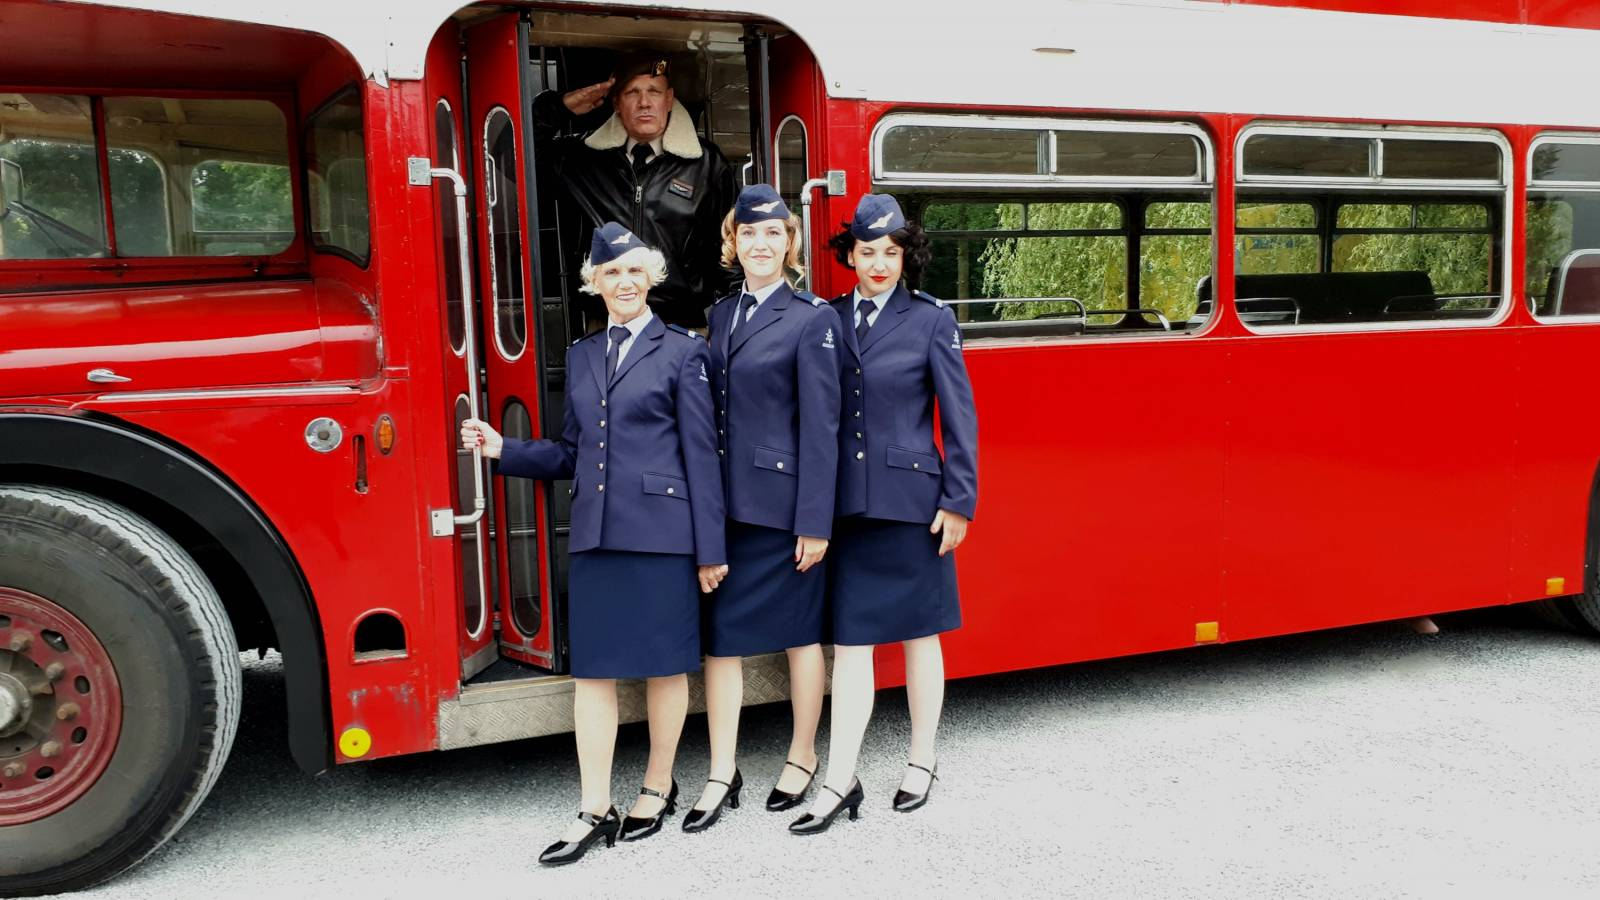 The London Ceremony Bus - Trouwvervoer - Ceremonievervoer - Bus - House of Weddings - 17